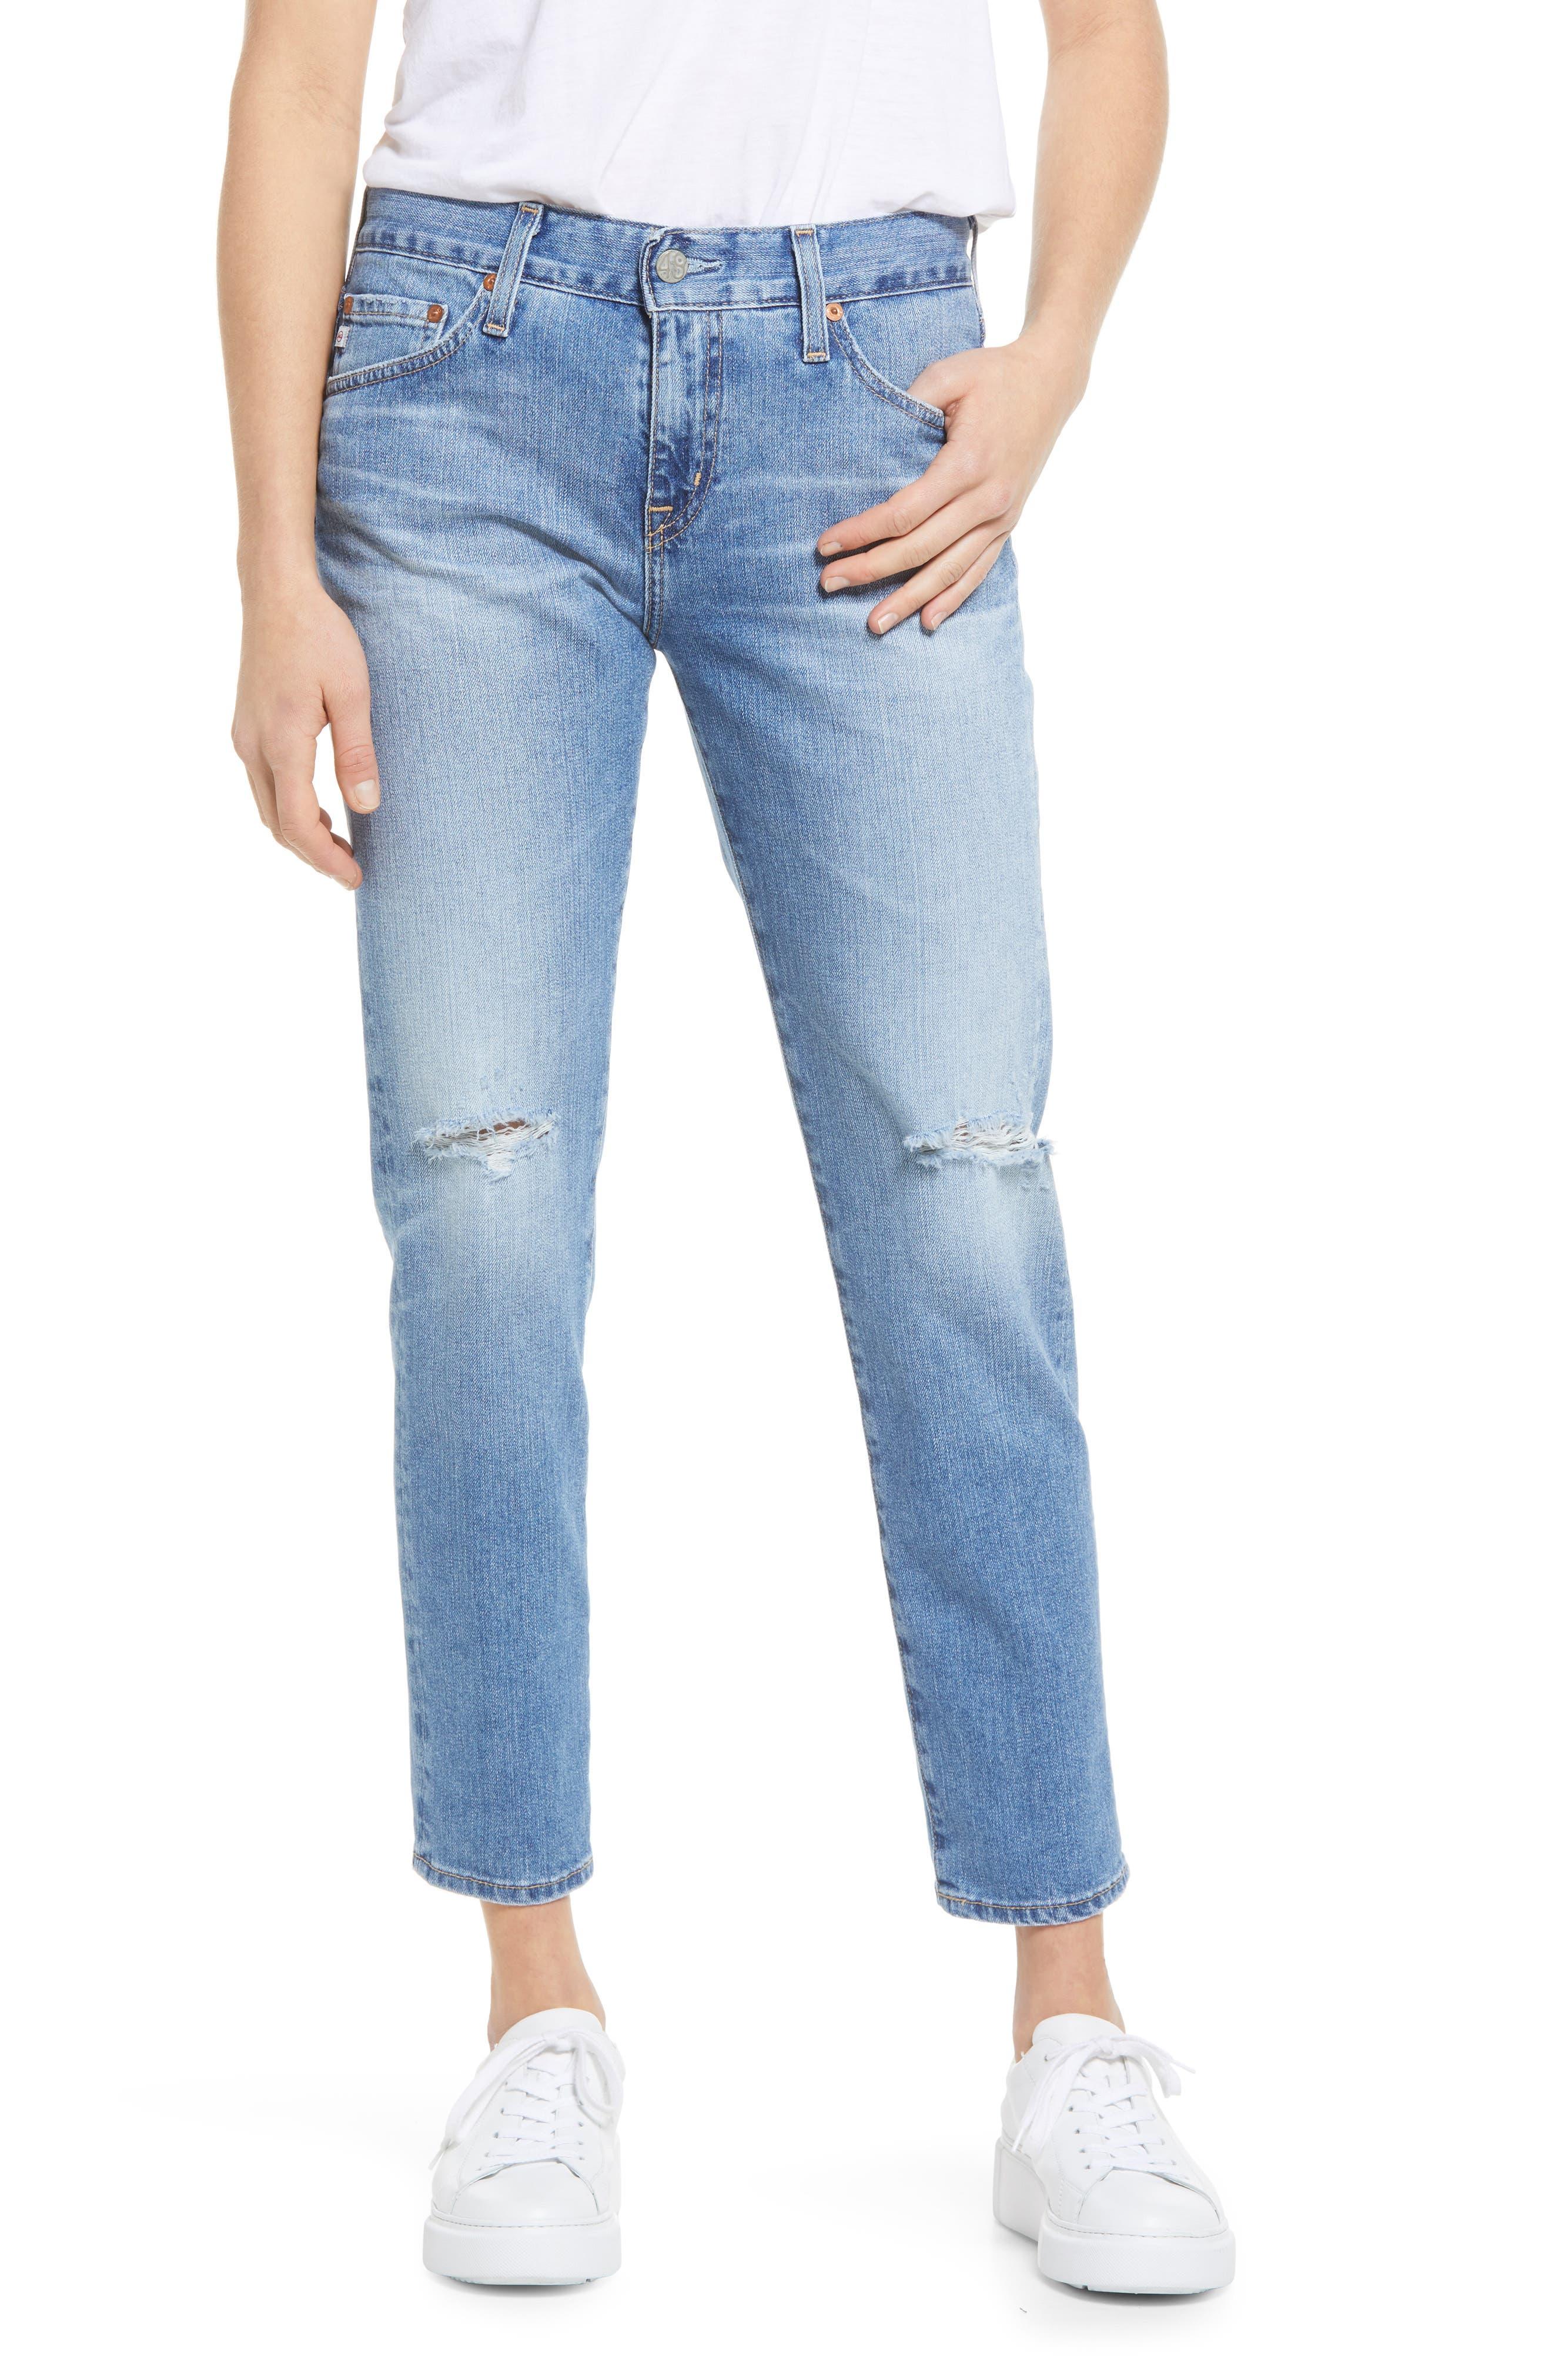 Ex-Boyfriend Distressed Slim Fit Jeans